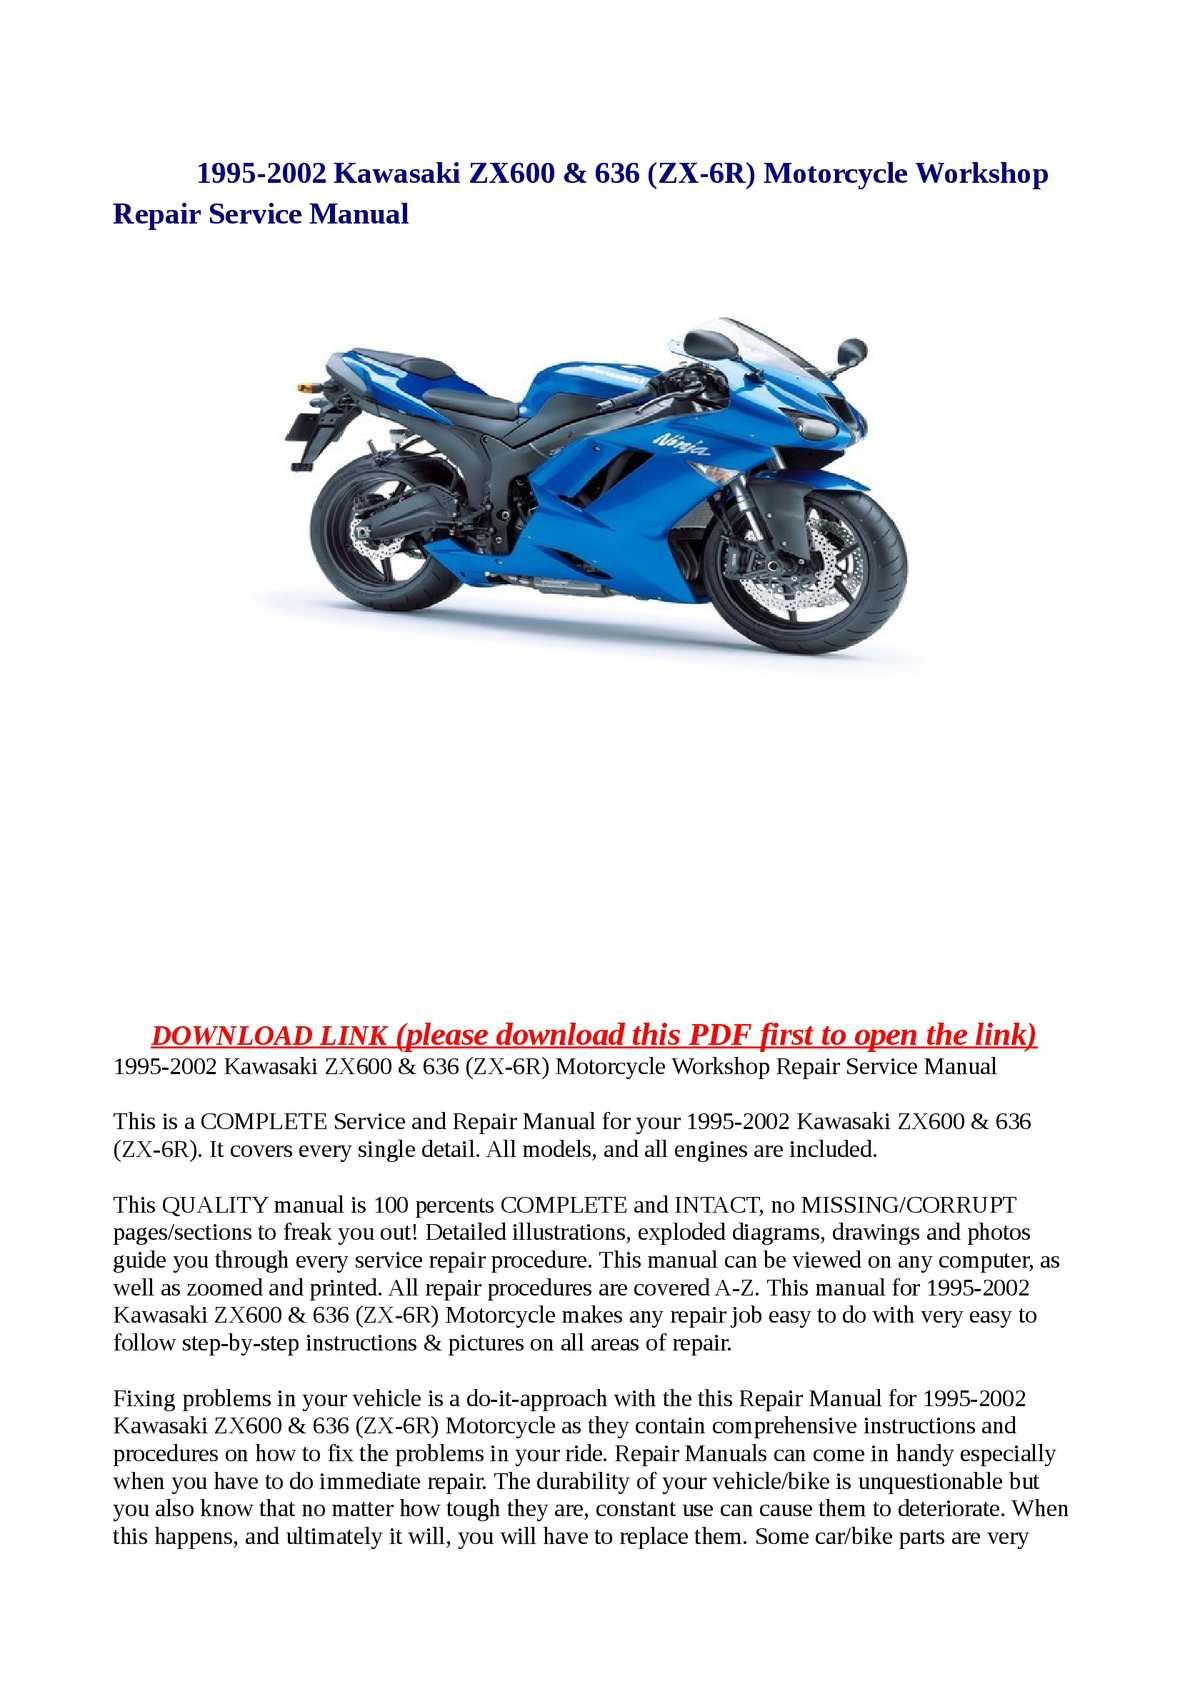 Calameo 1995 2002 Kawasaki Zx600 636 Zx 6r Motorcycle Workshop Repair Service Manual